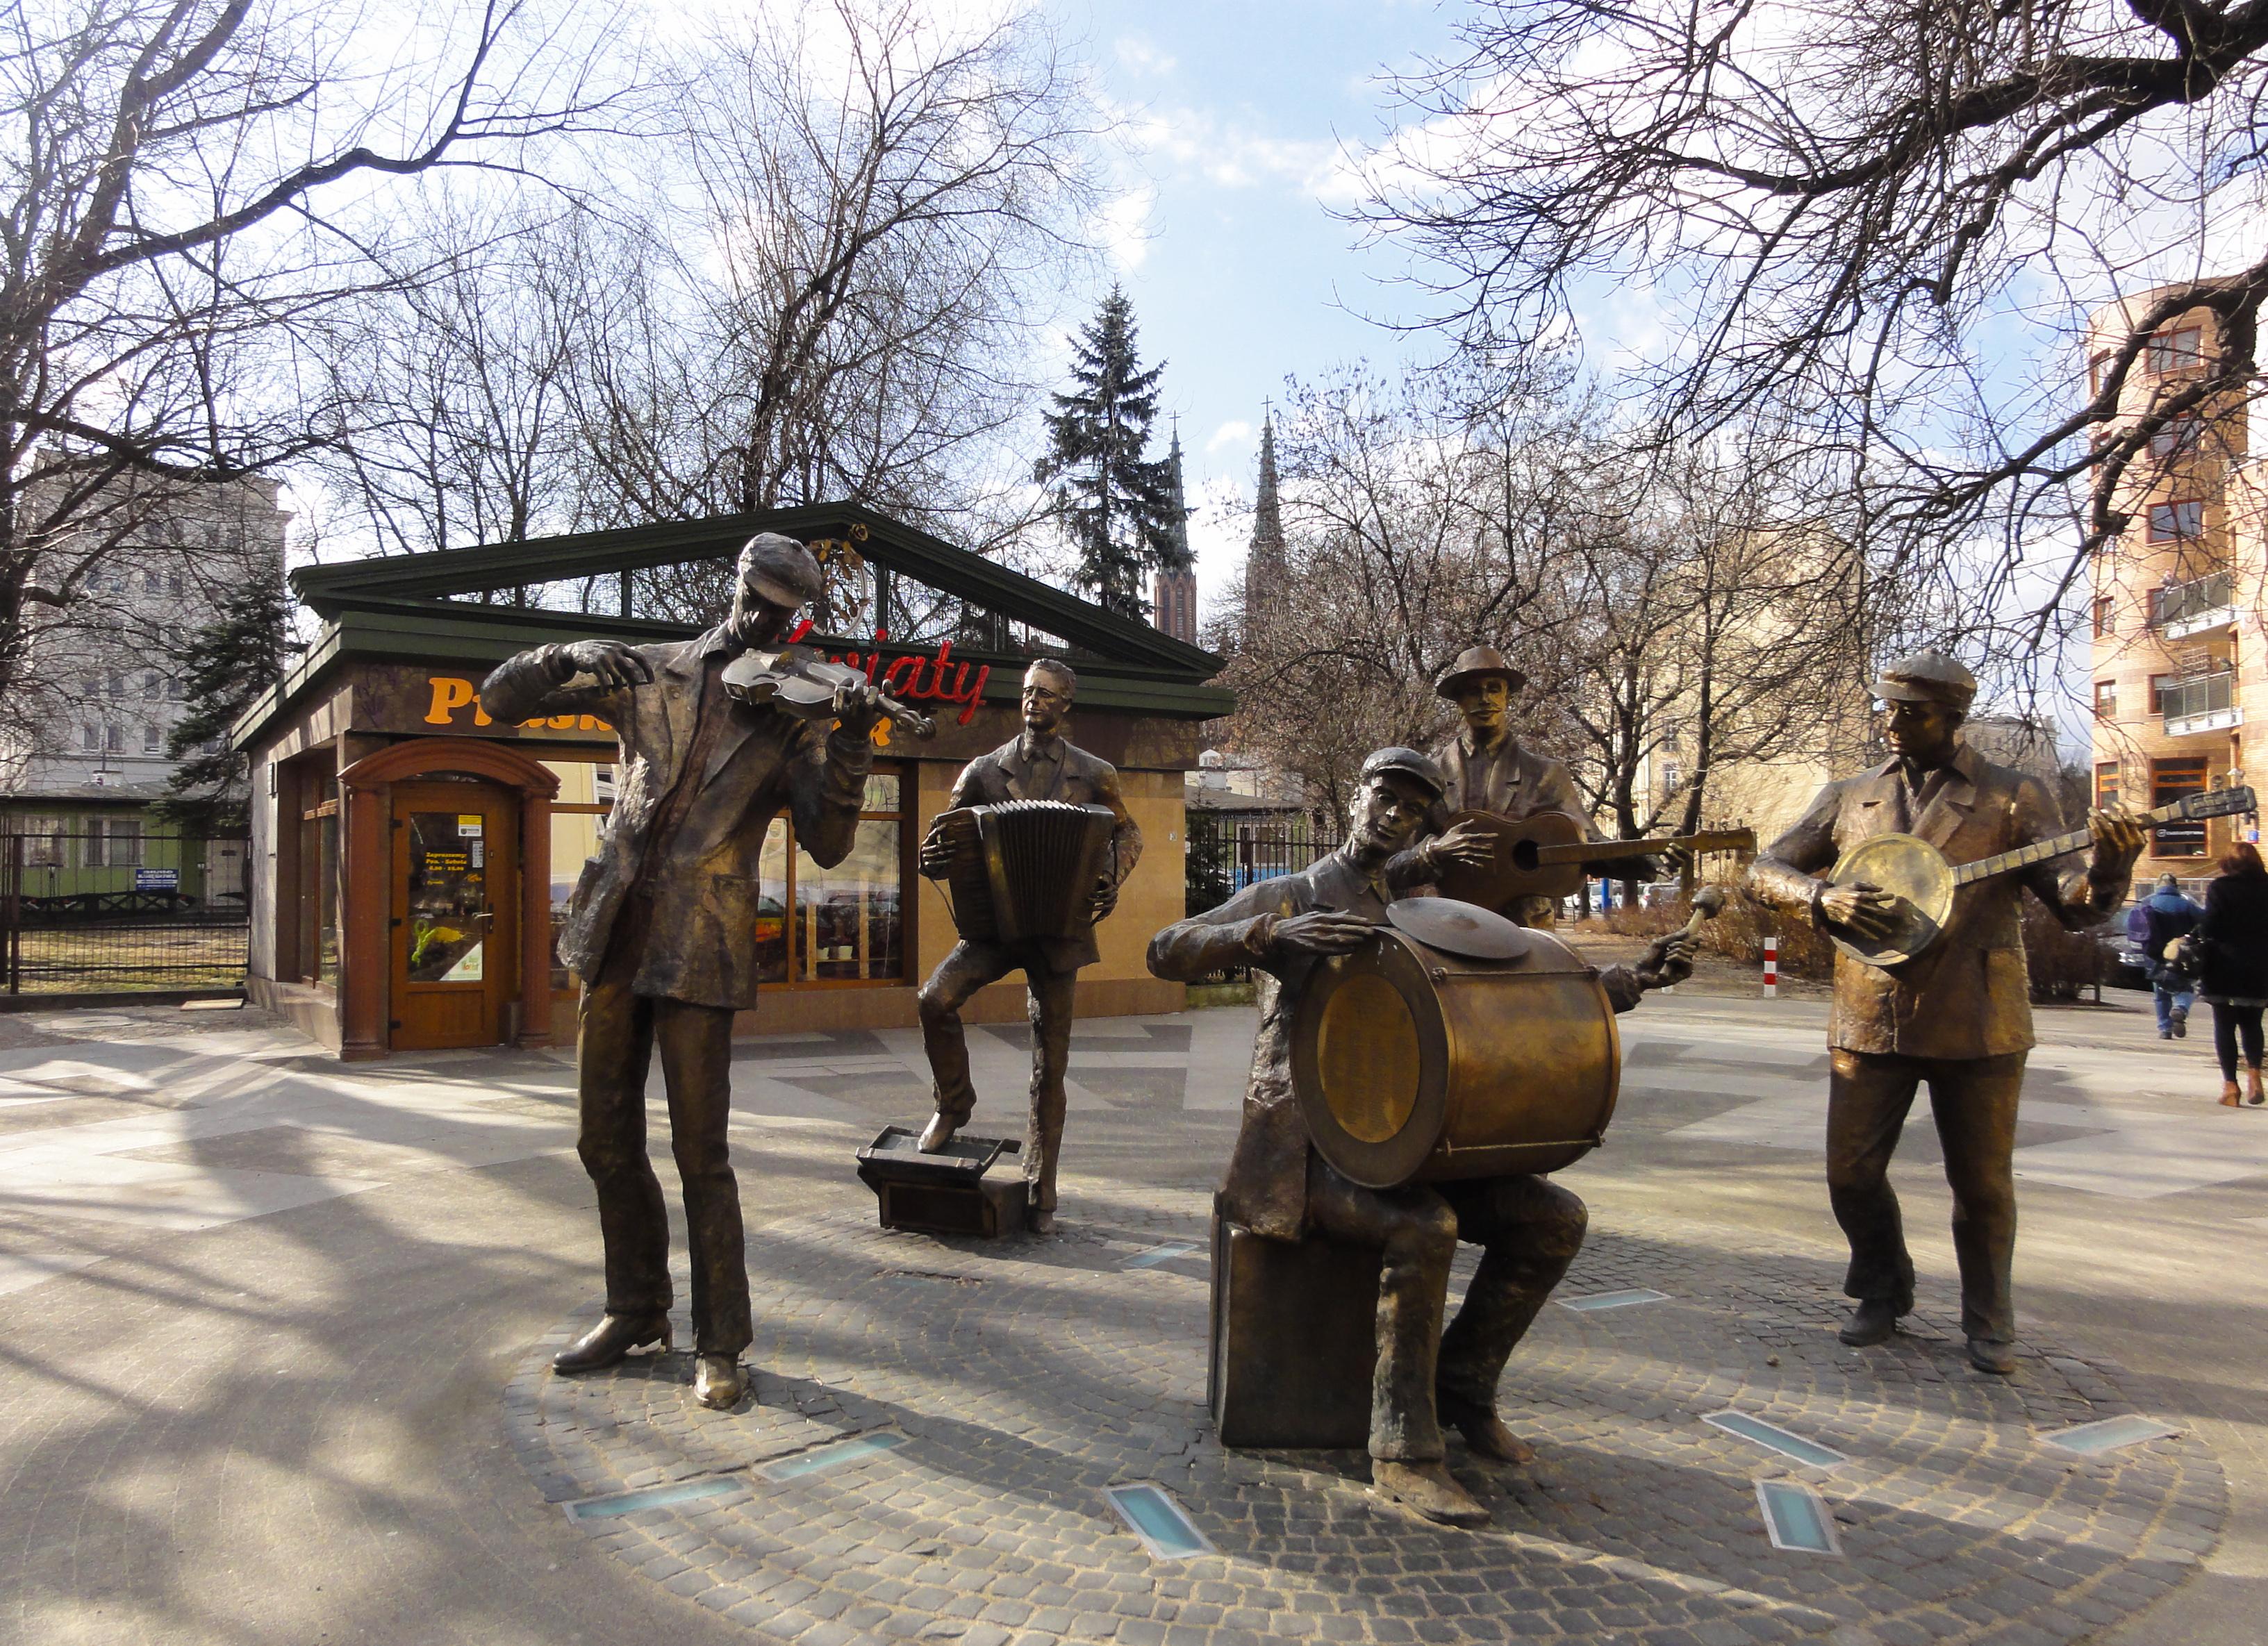 Description Unusual lifesize group sculpture of street musicians in